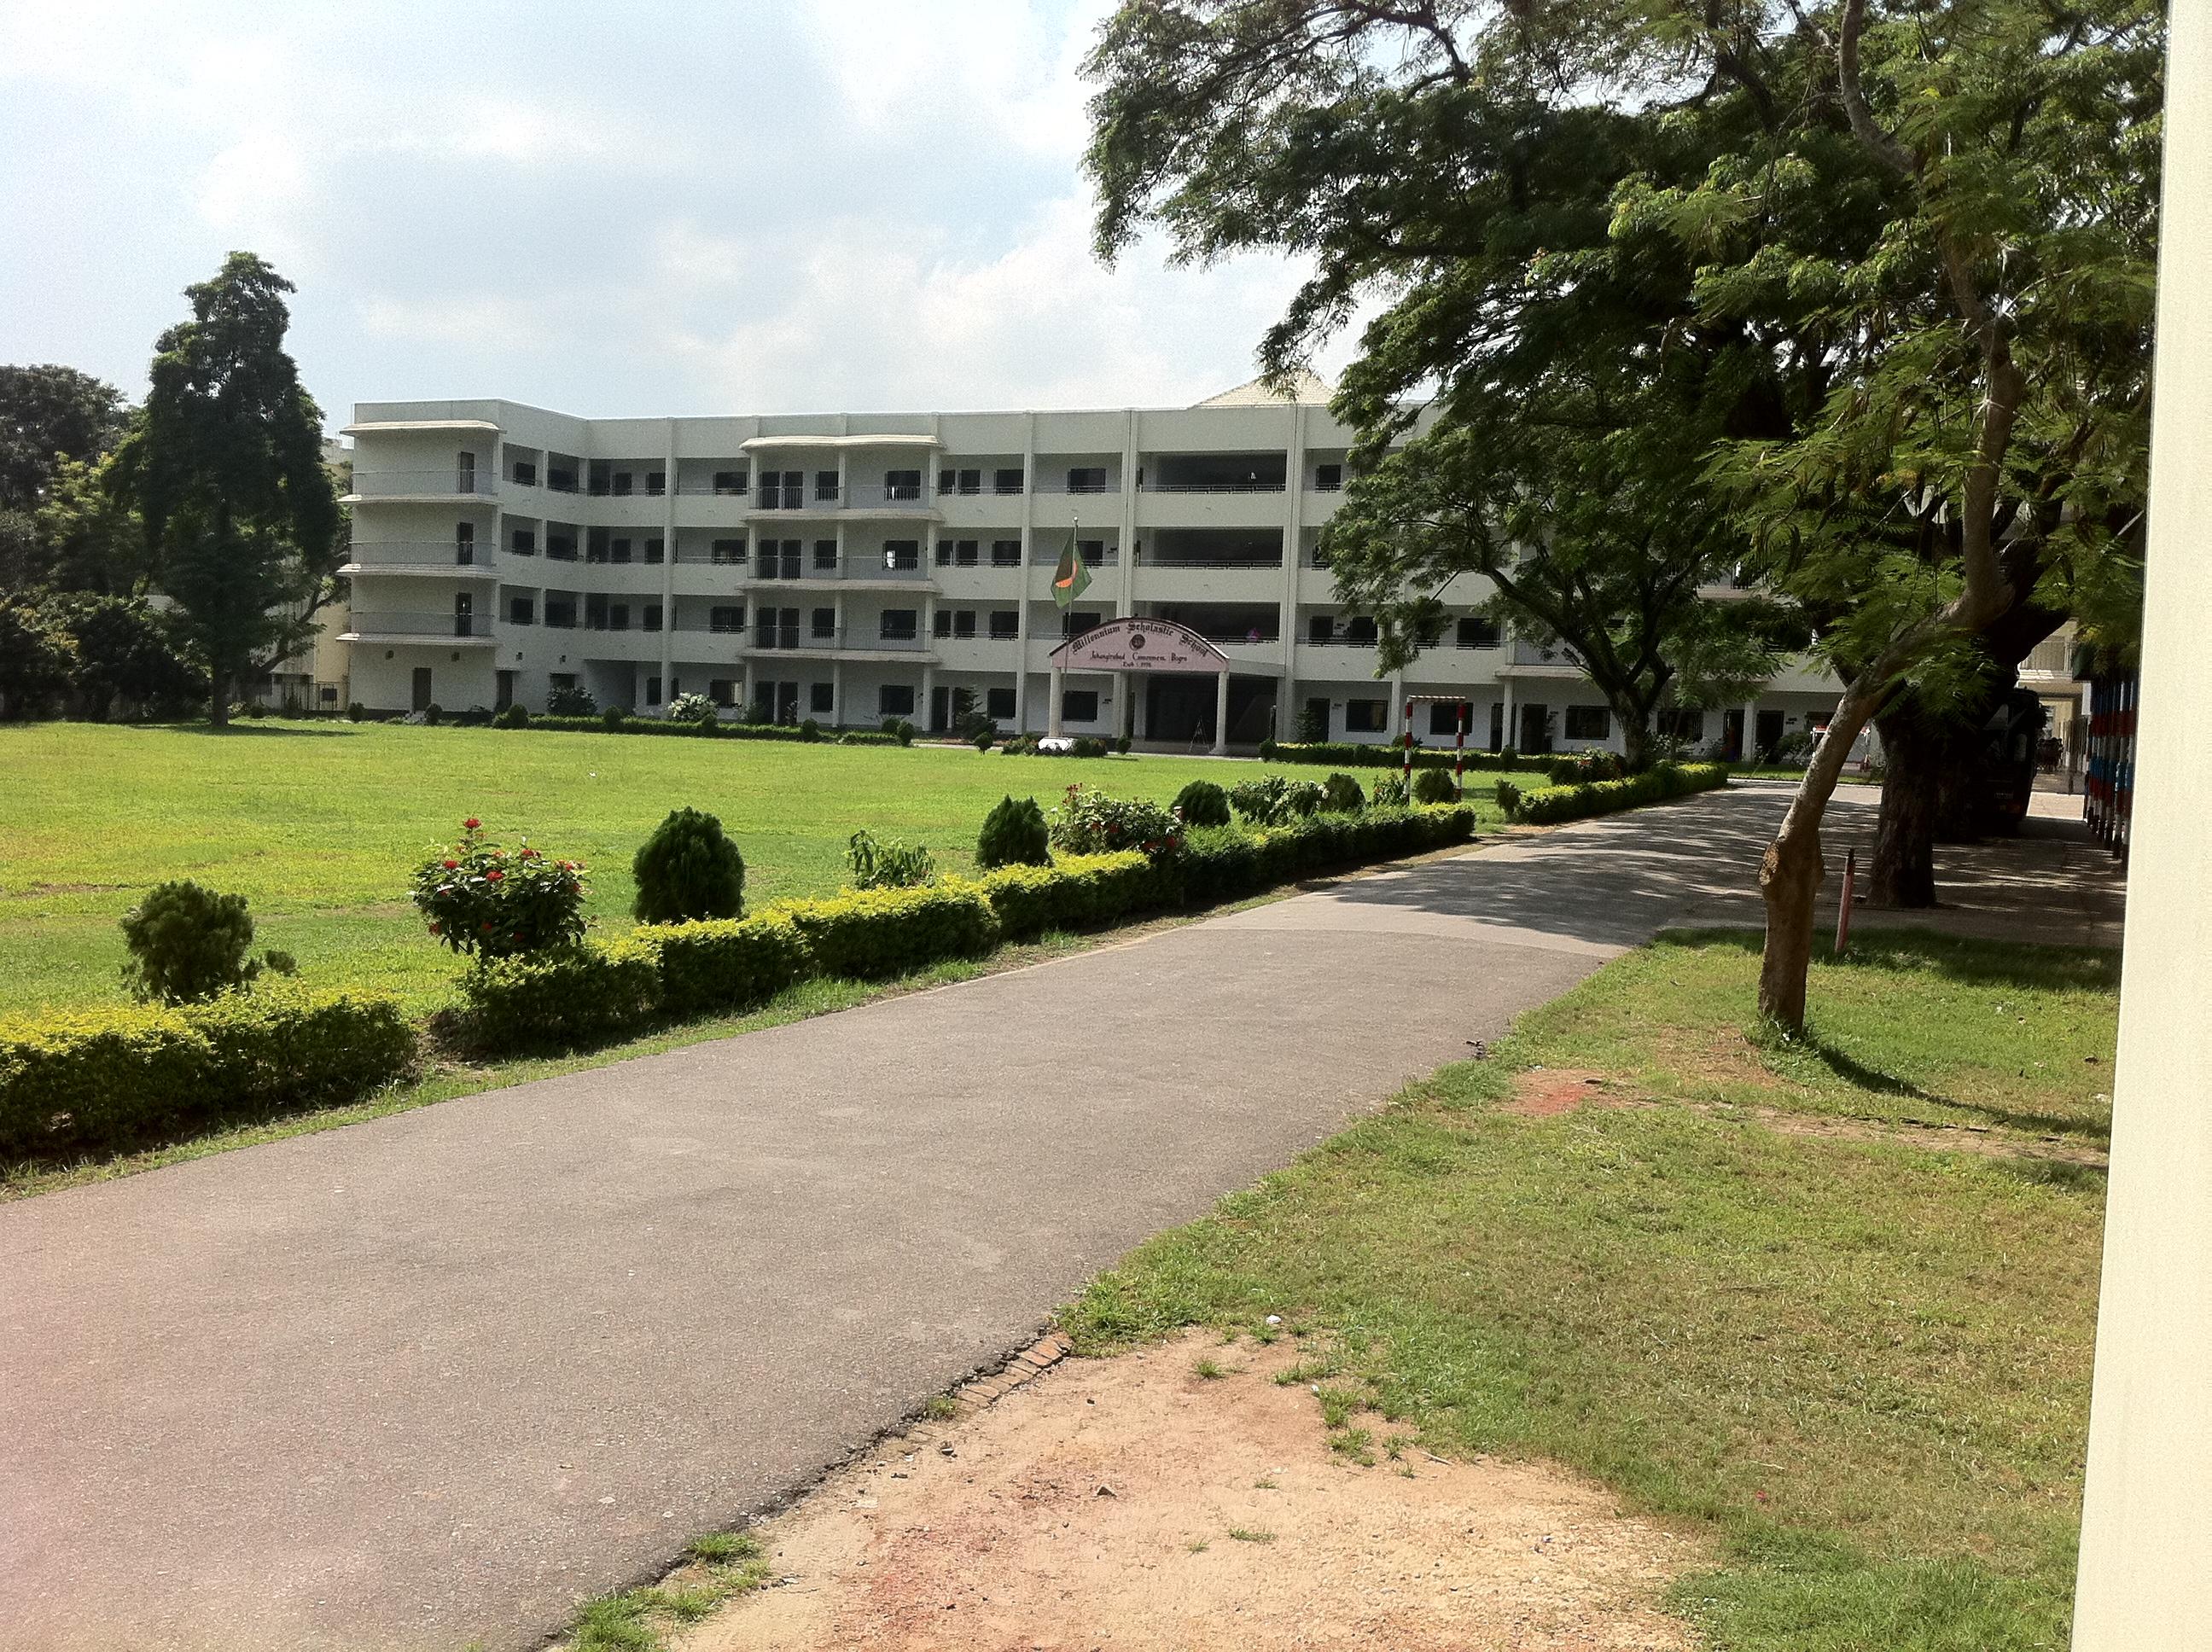 Millennium Scholastic School & College - Wikipedia